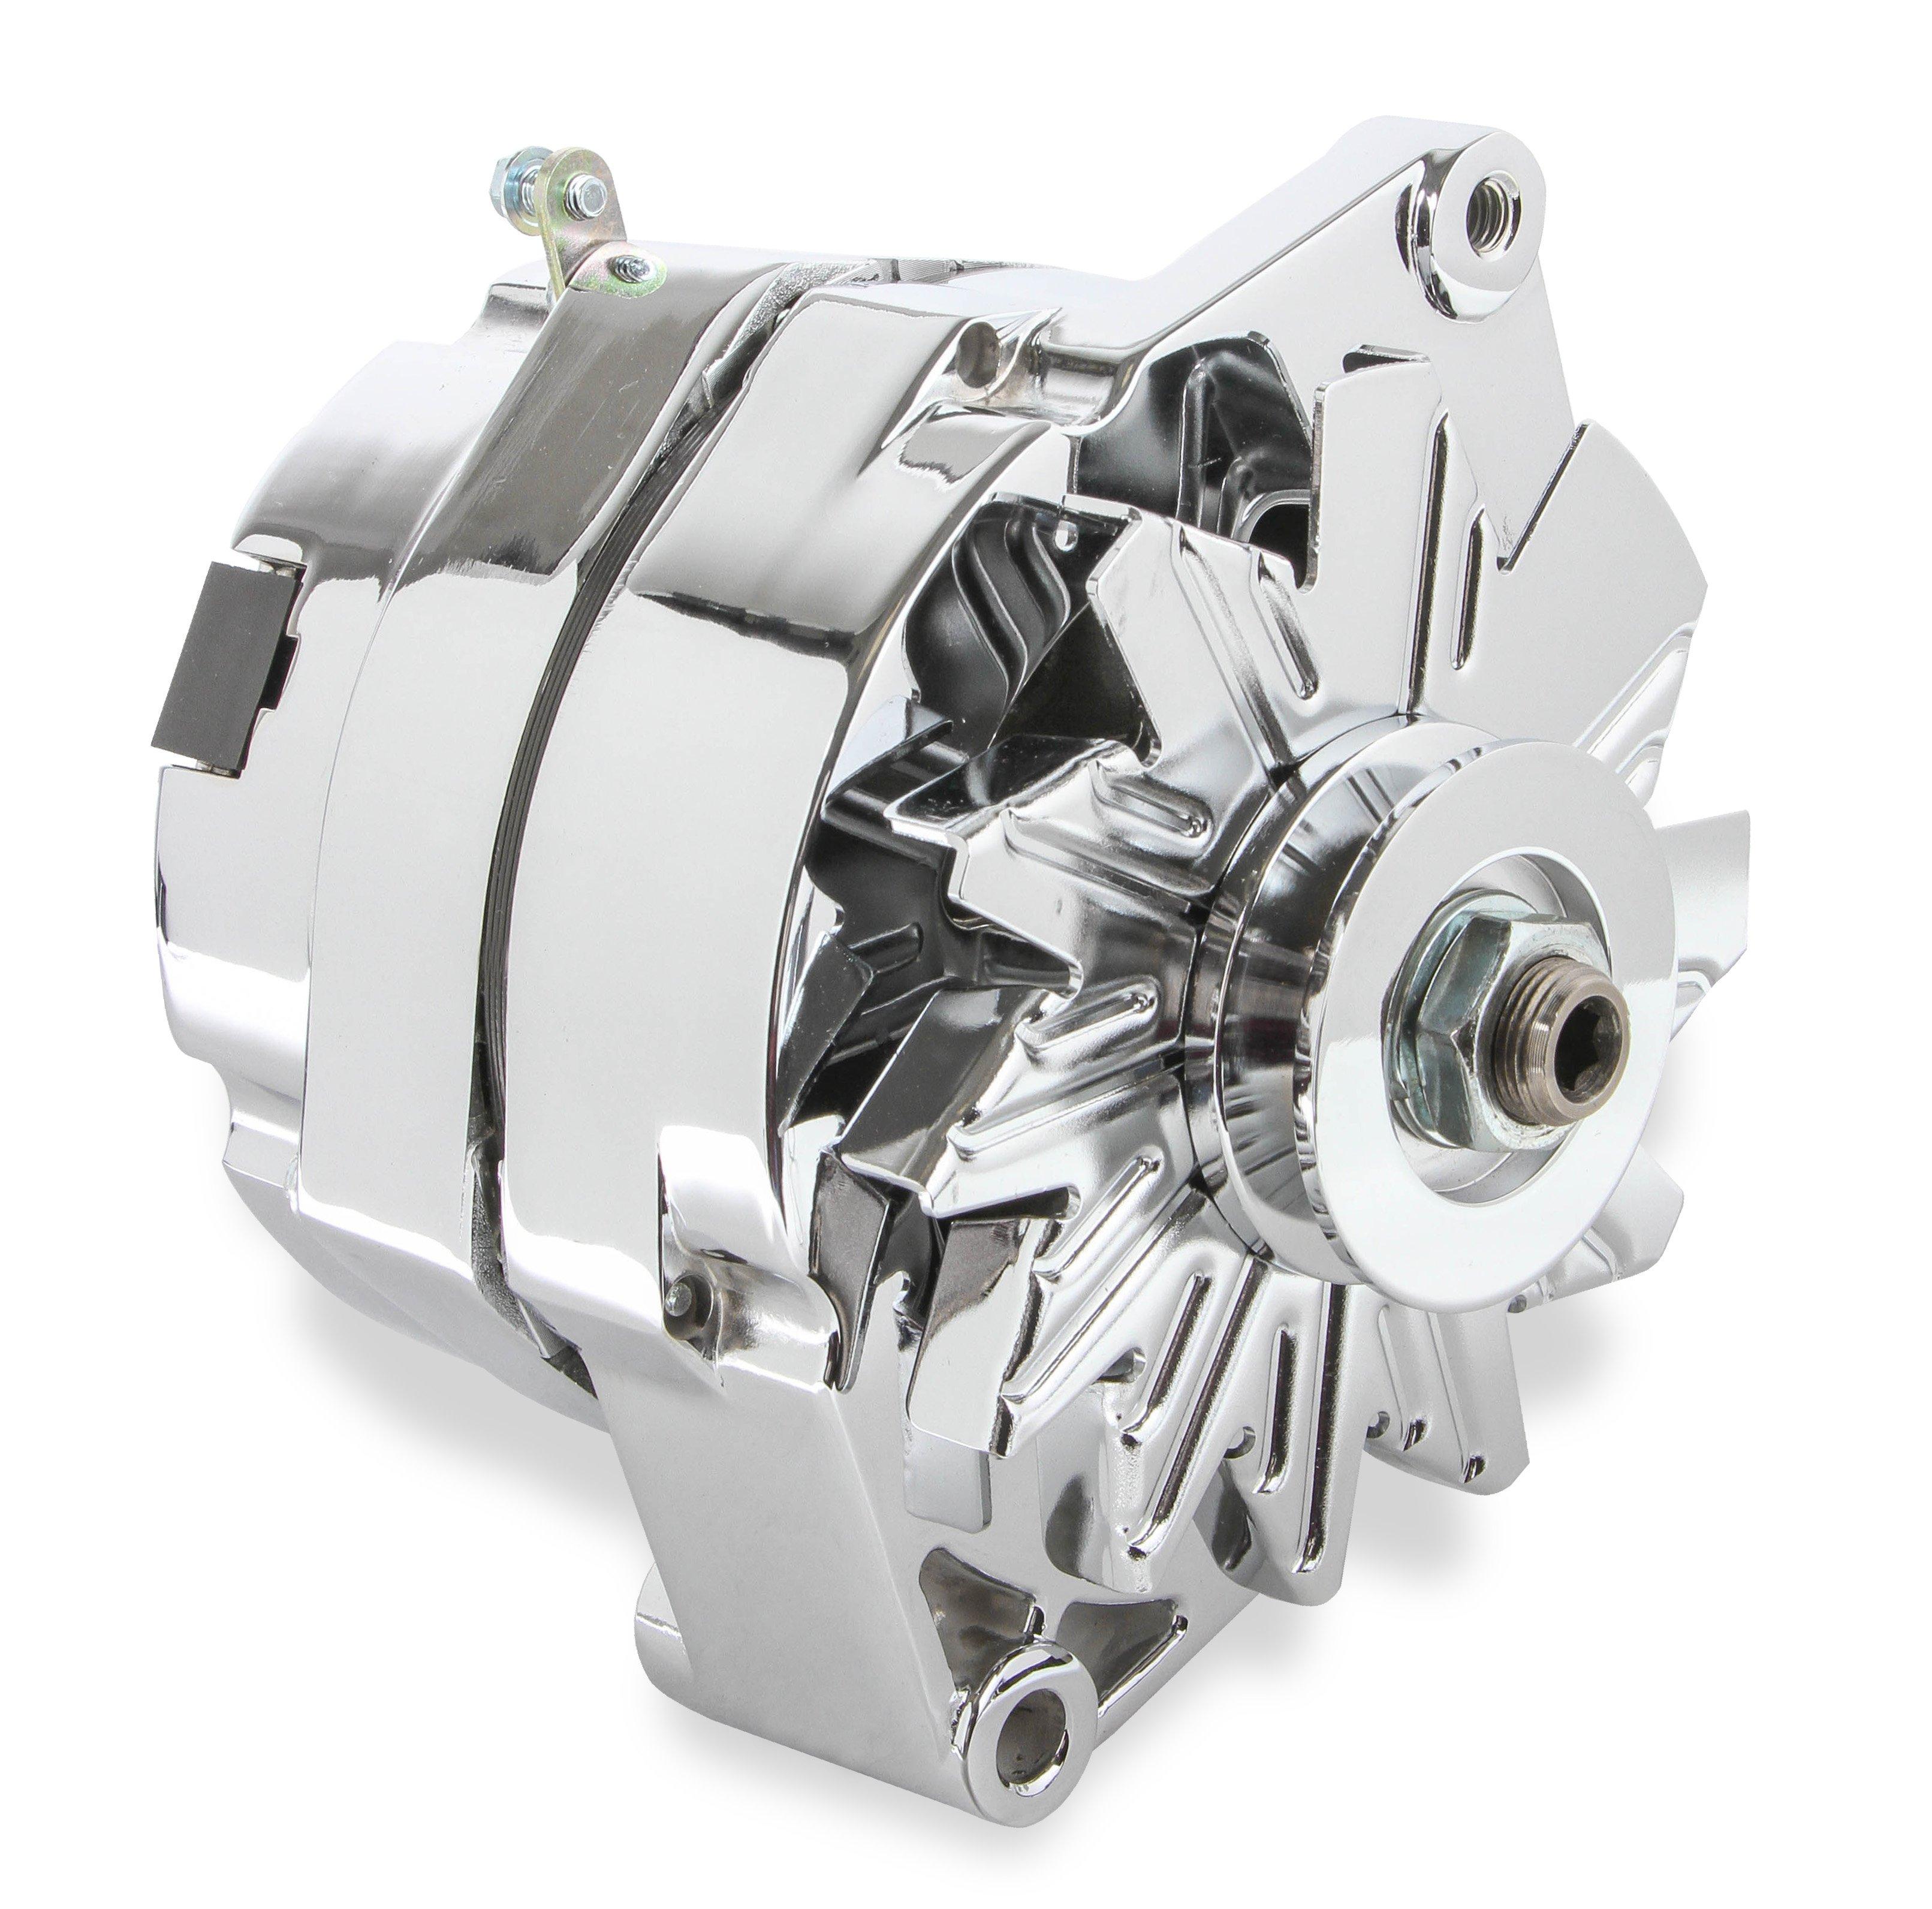 Mr Gasket 5122 Chrome Alternator Late Gm Delco 80 Amp 100 Wiring Image